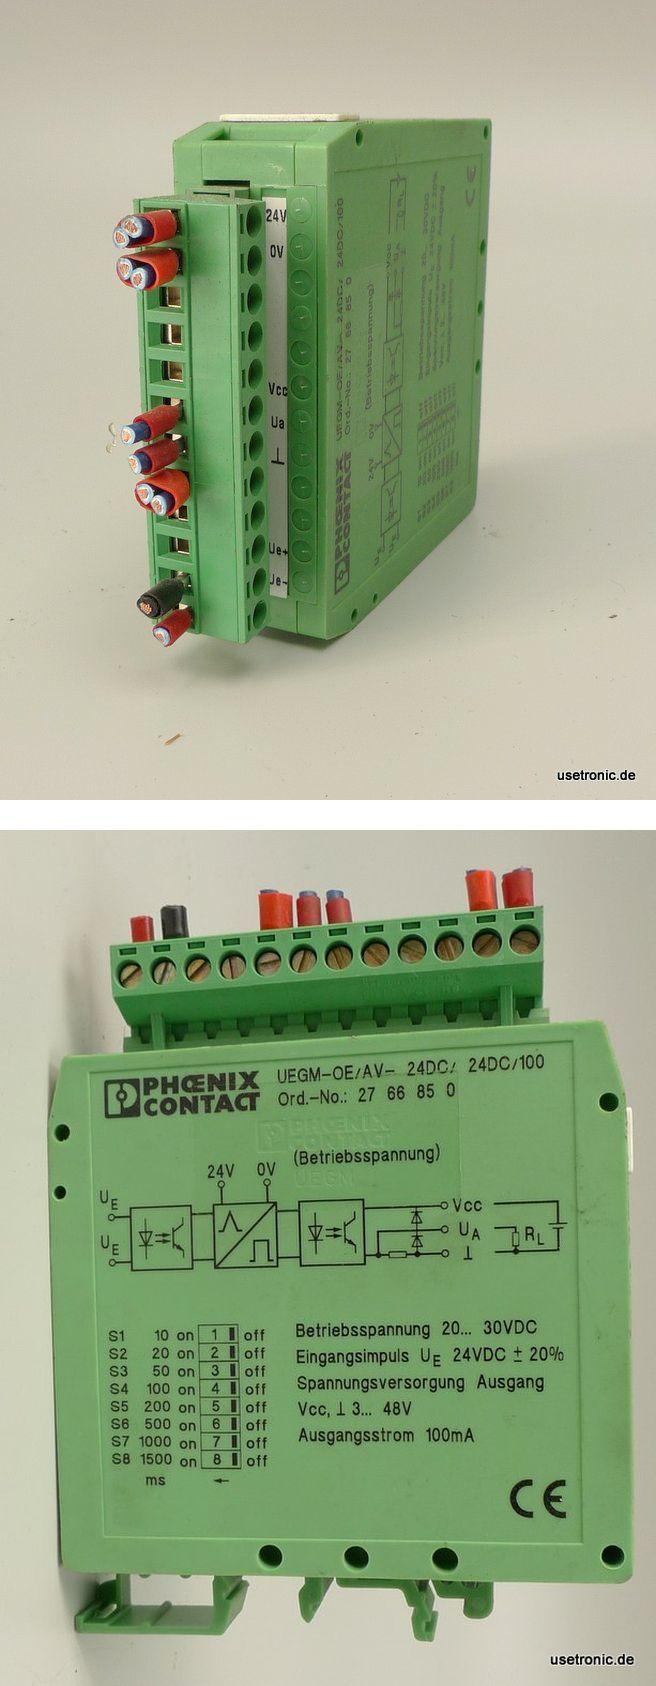 Phoenix Contact UEGM-OE/AV-24VDC 2766850 Impulsverlängerungsbaustein